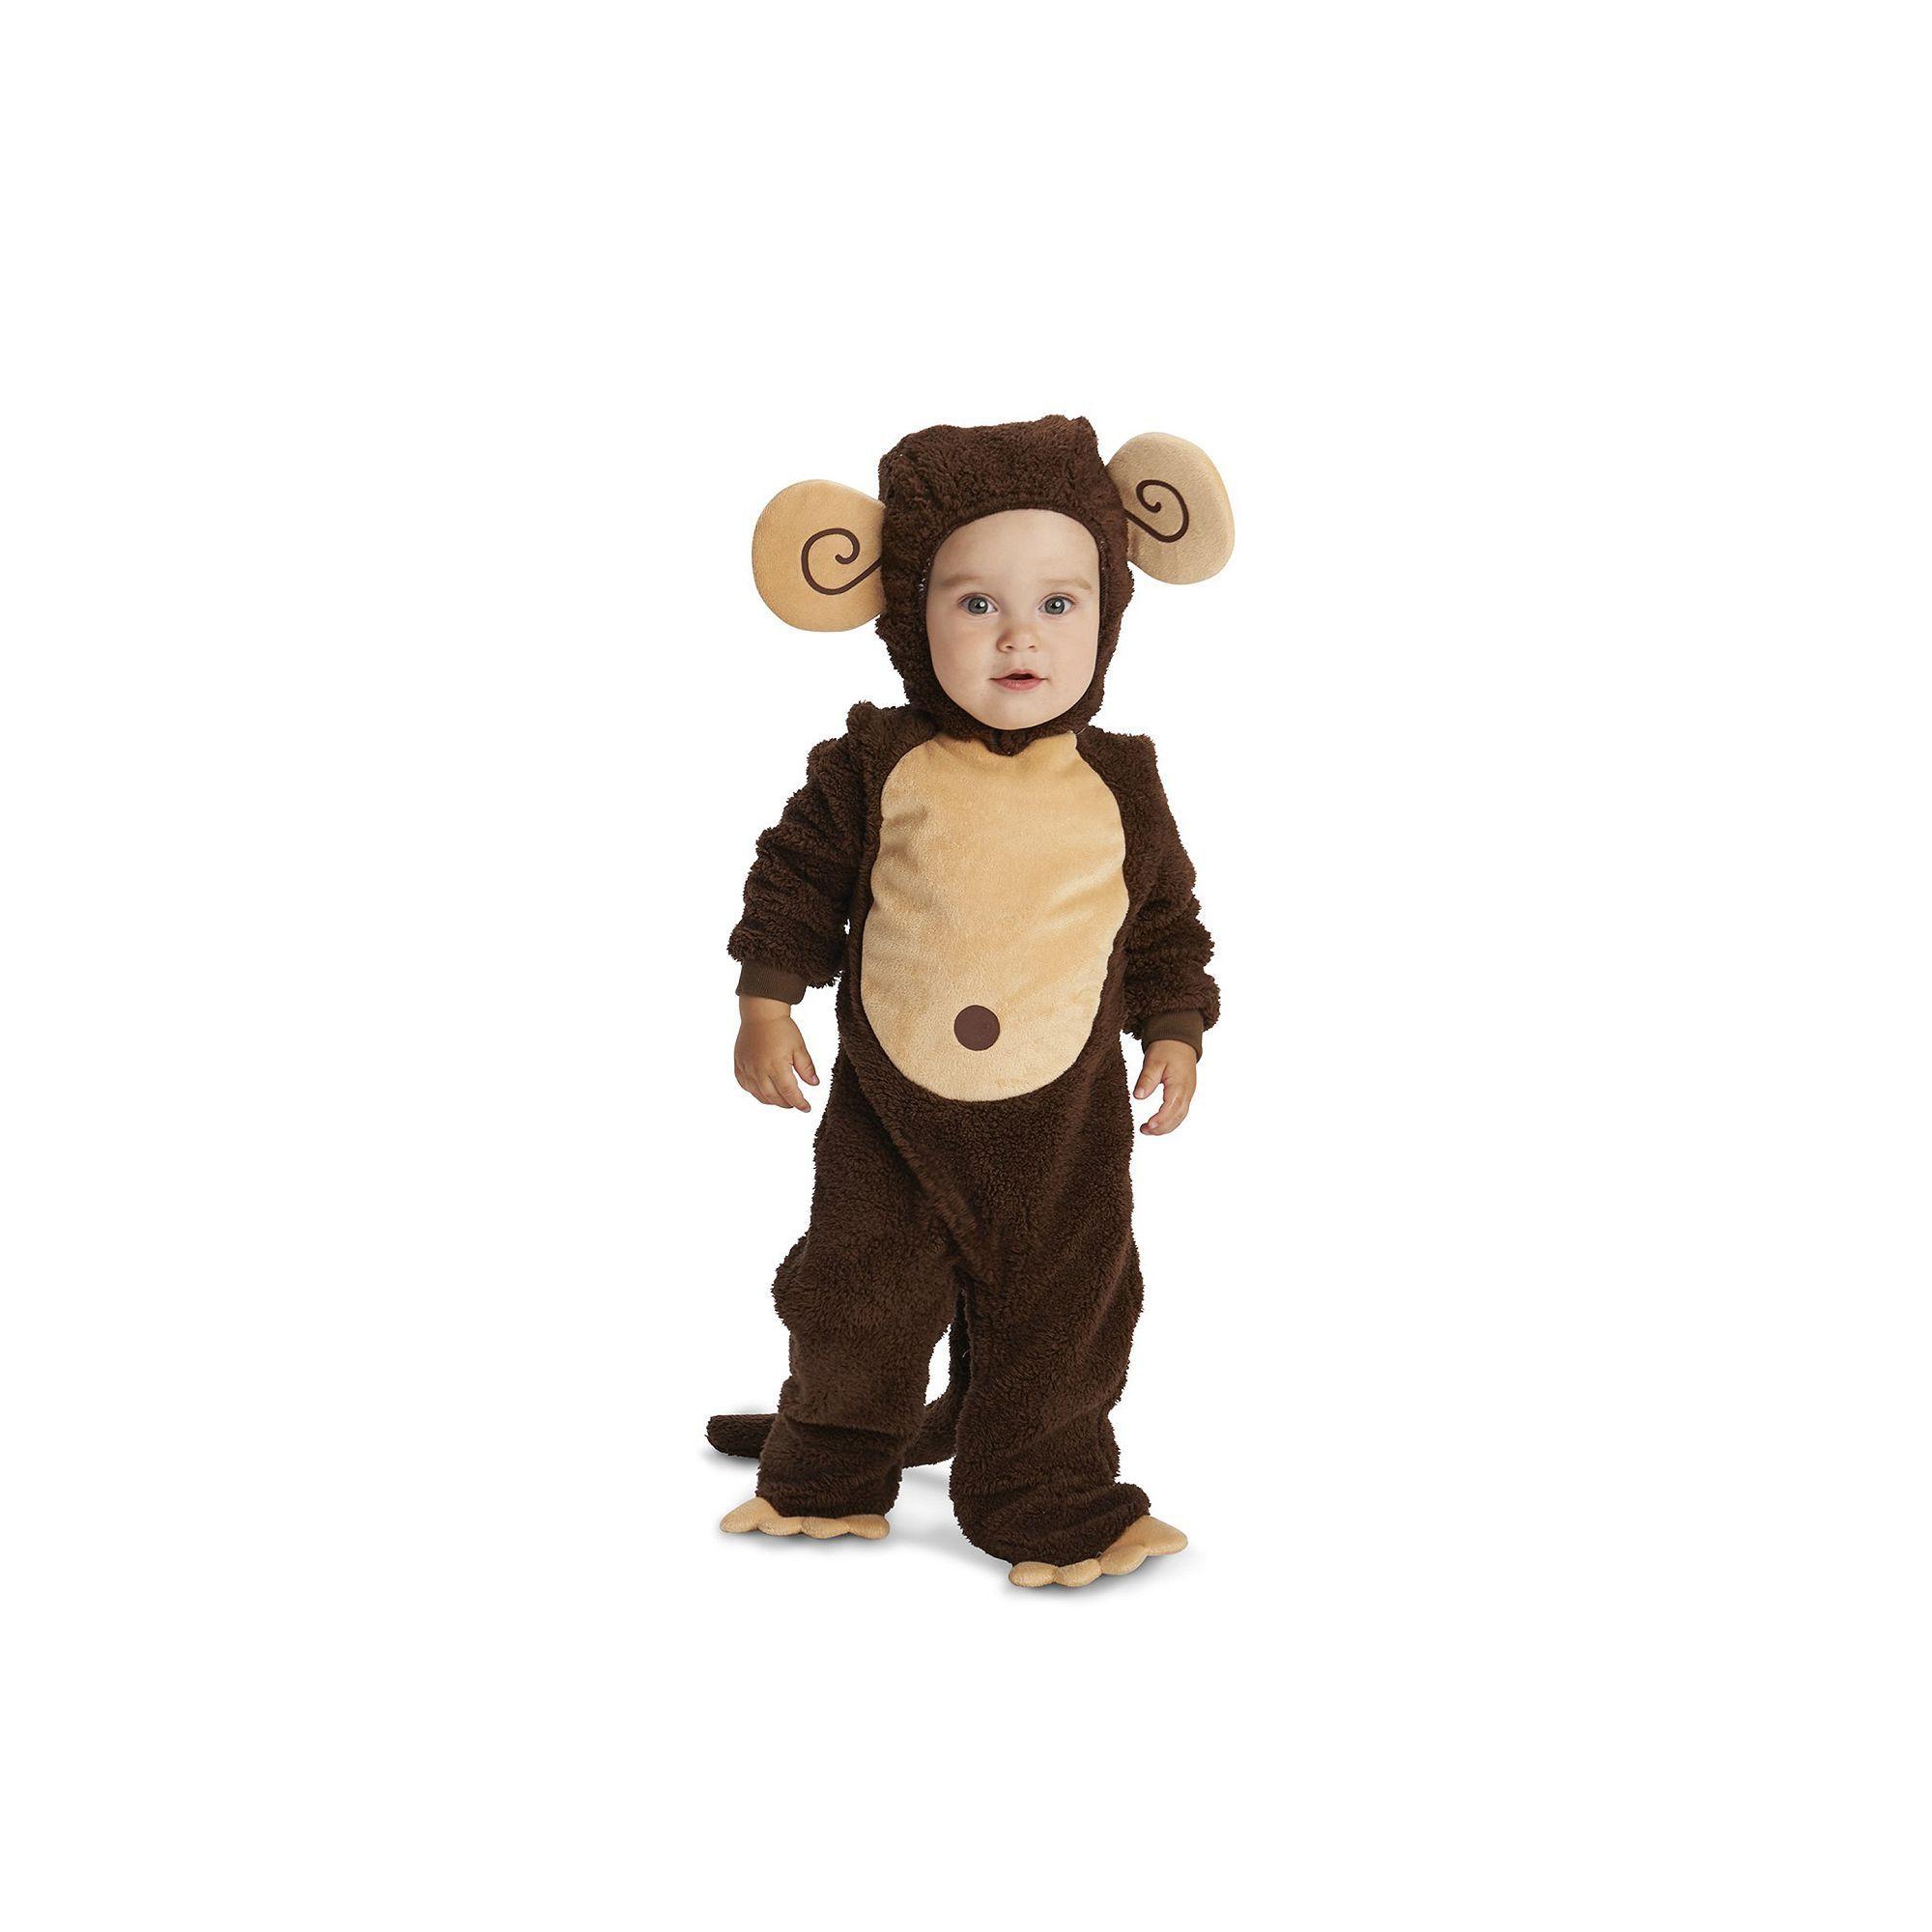 Baby Lovely Monkey Costume Infant Unisex Size 18-24MONTH Multicolor  sc 1 st  Pinterest & Baby Lovely Monkey Costume Infant Unisex Size: 18-24MONTH ...